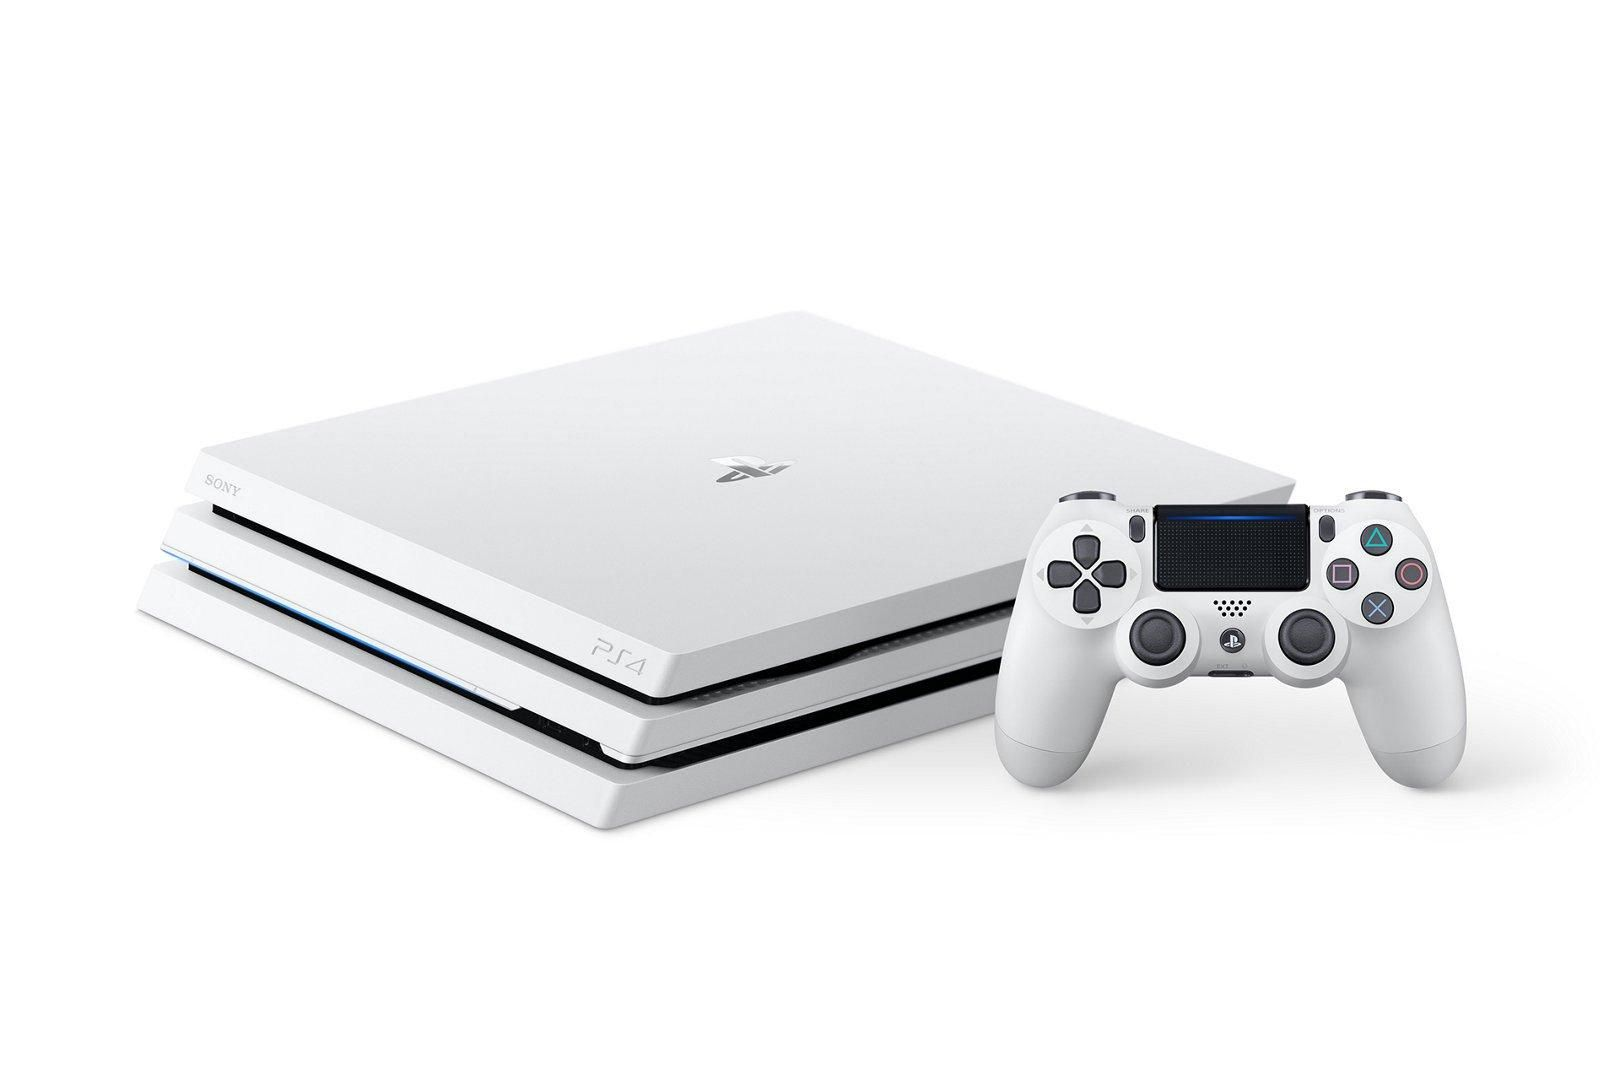 Playstation 4 Pro Glacier White 1tb Ps4 Pro Ps4 Console Ps4